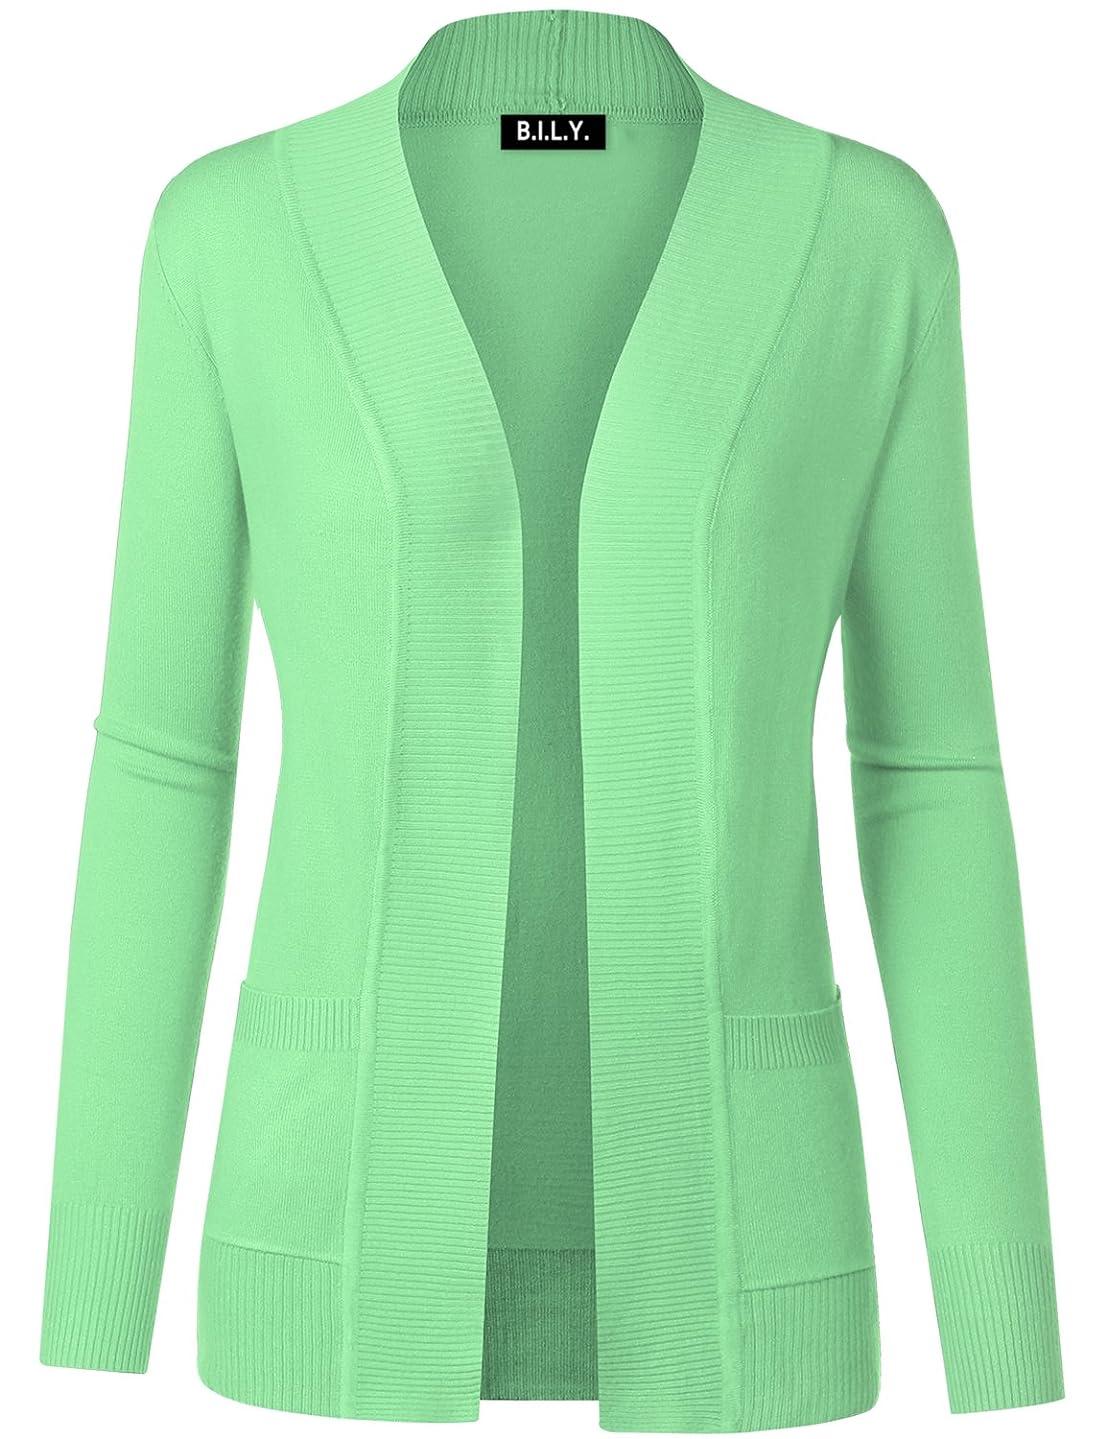 BH B.I.L.Y USA Women's Open Front Long Sleeve Classic Knit Cardigan Mint 2 Medium